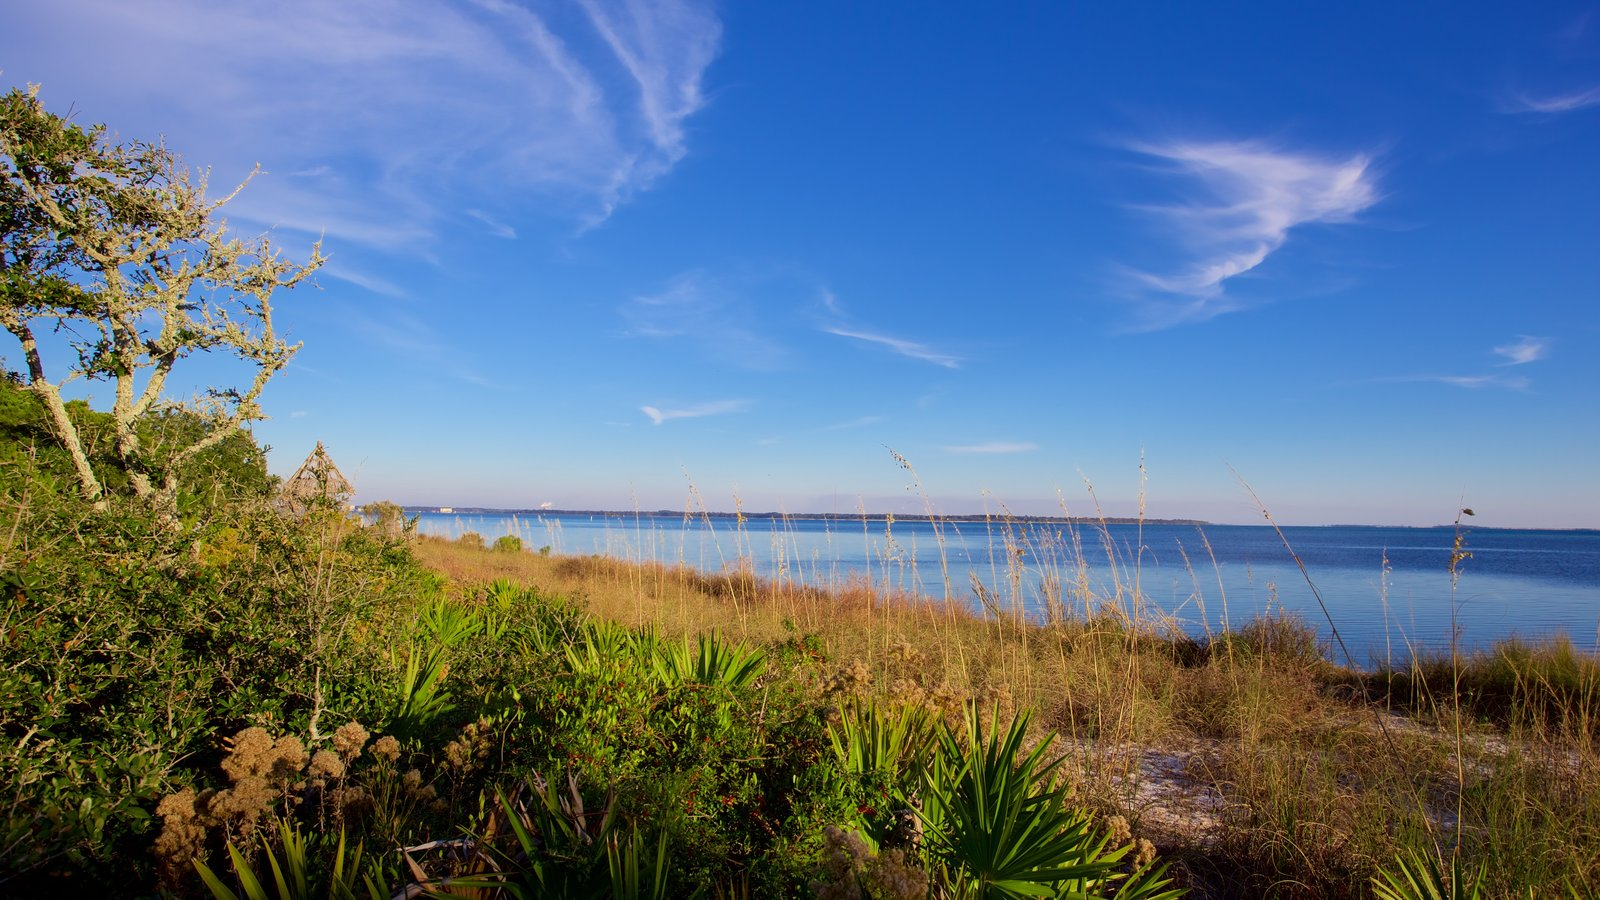 Upper Grand Lagoon caracterizando um lago ou charco e cenas tranquilas